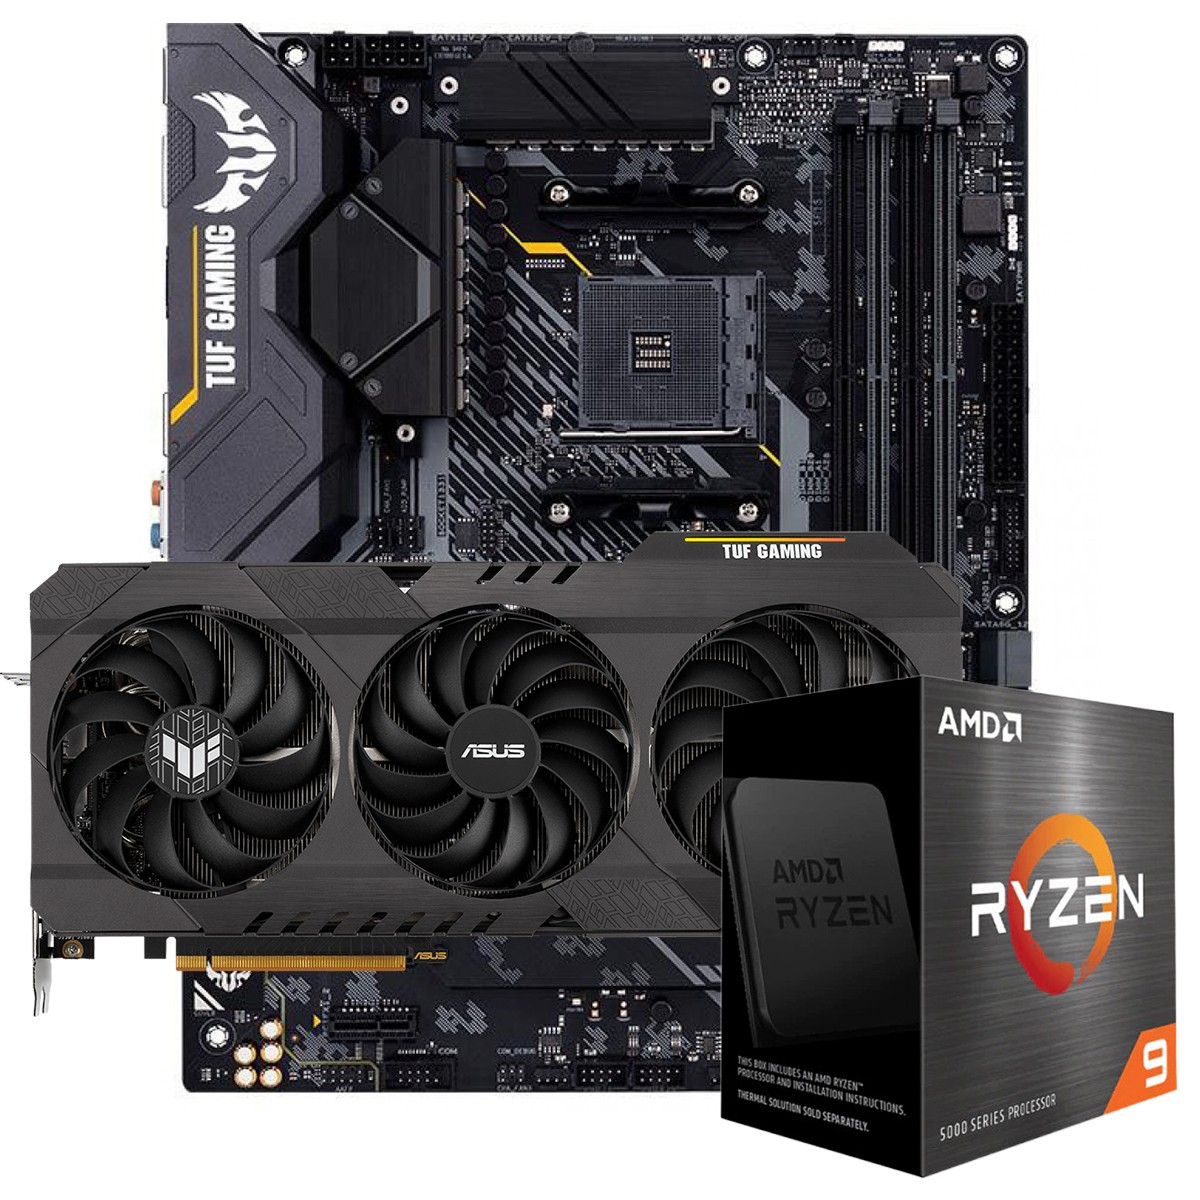 Kit Upgrade ASUS TUF Gaming Radeon RX 6700 XT OC + AMD Ryzen 9 5900X + ASUS TUF Gaming X570-Plus